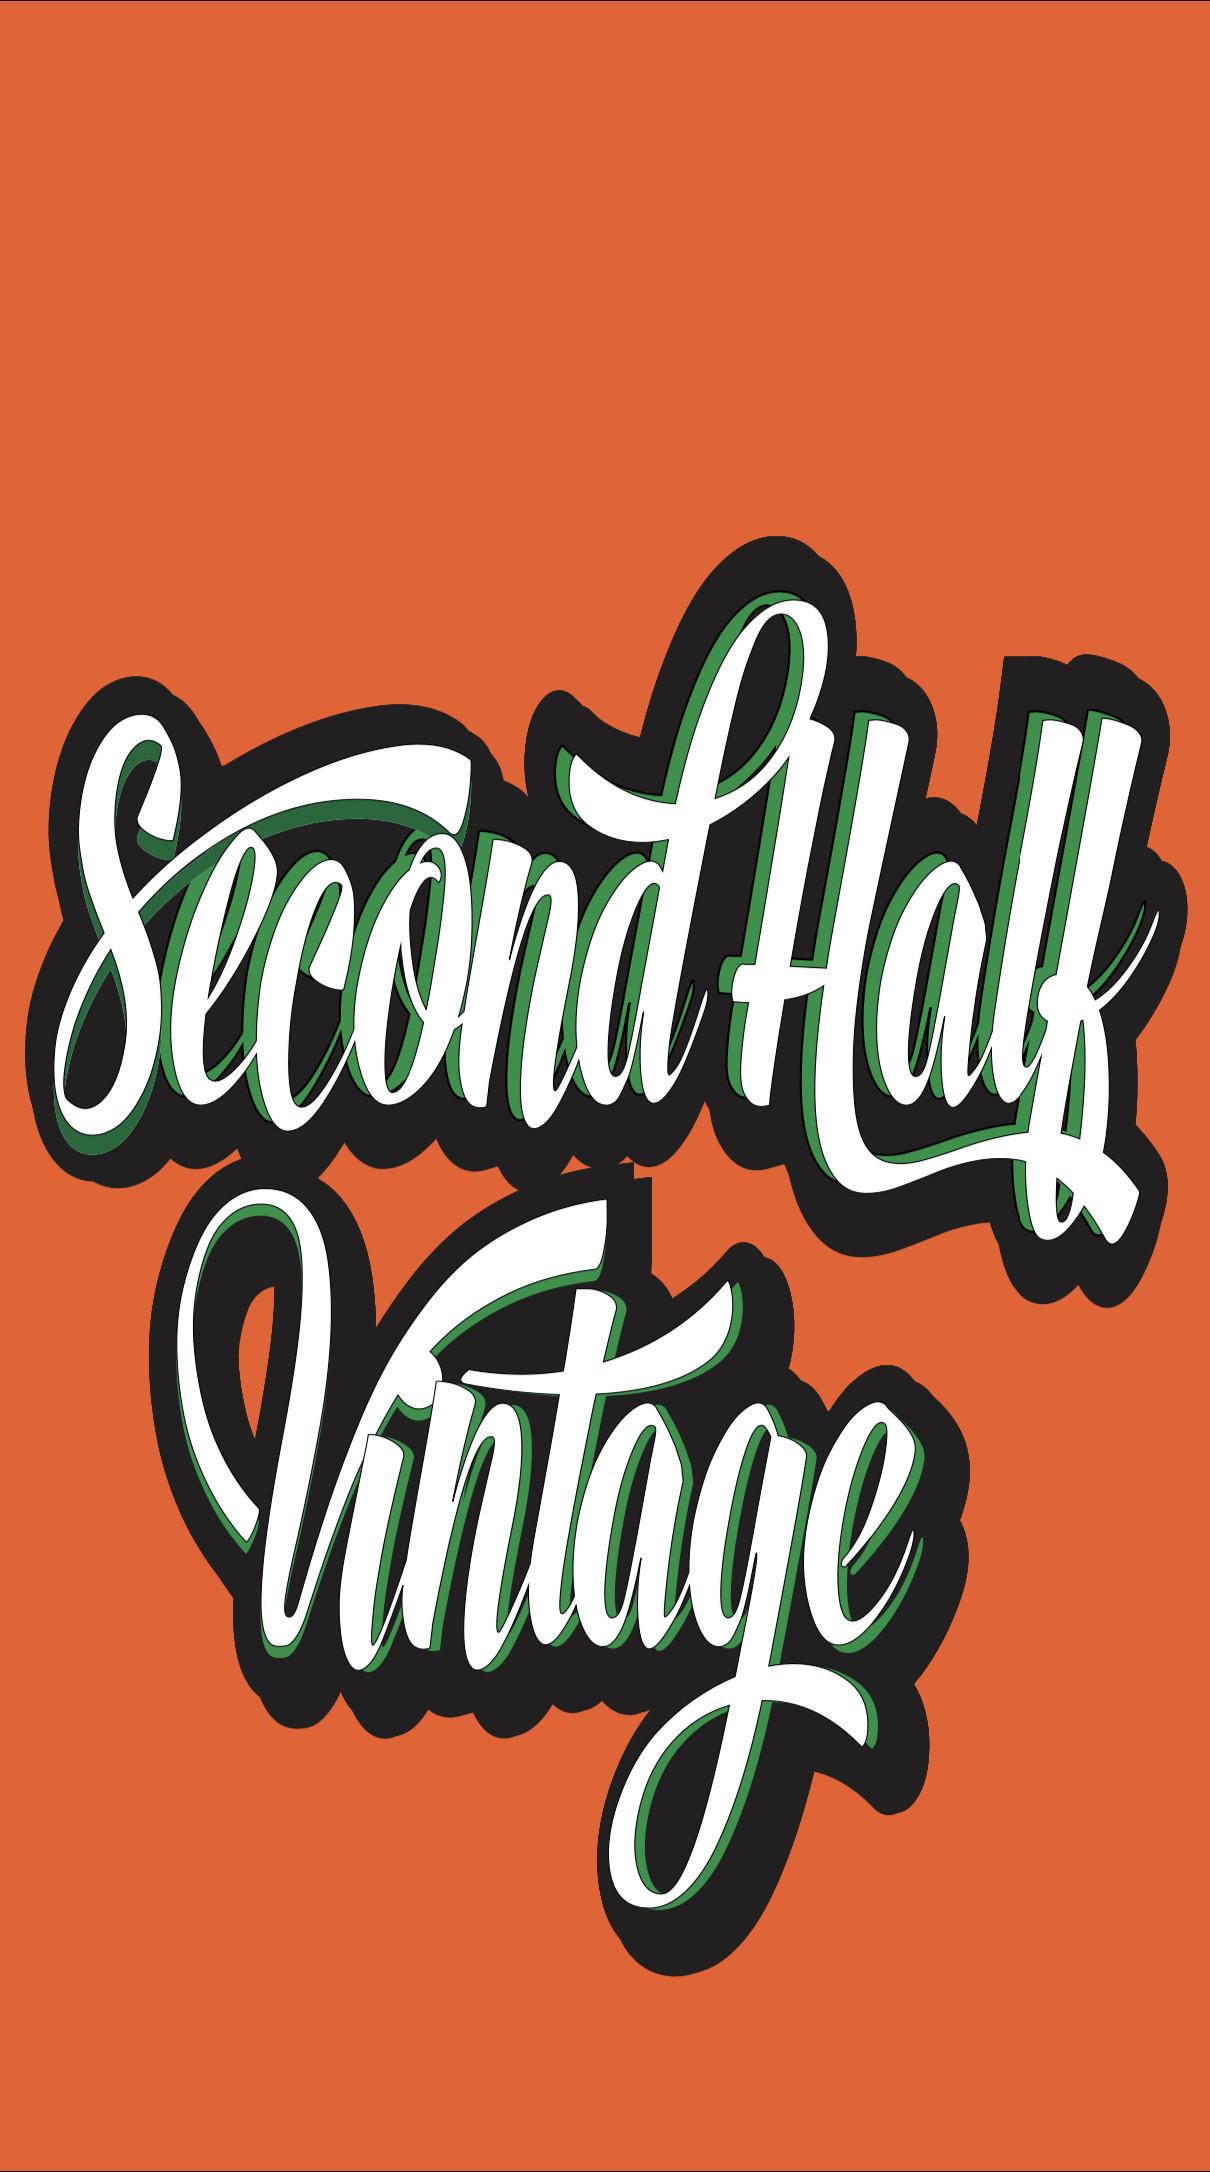 Second Half Vintage